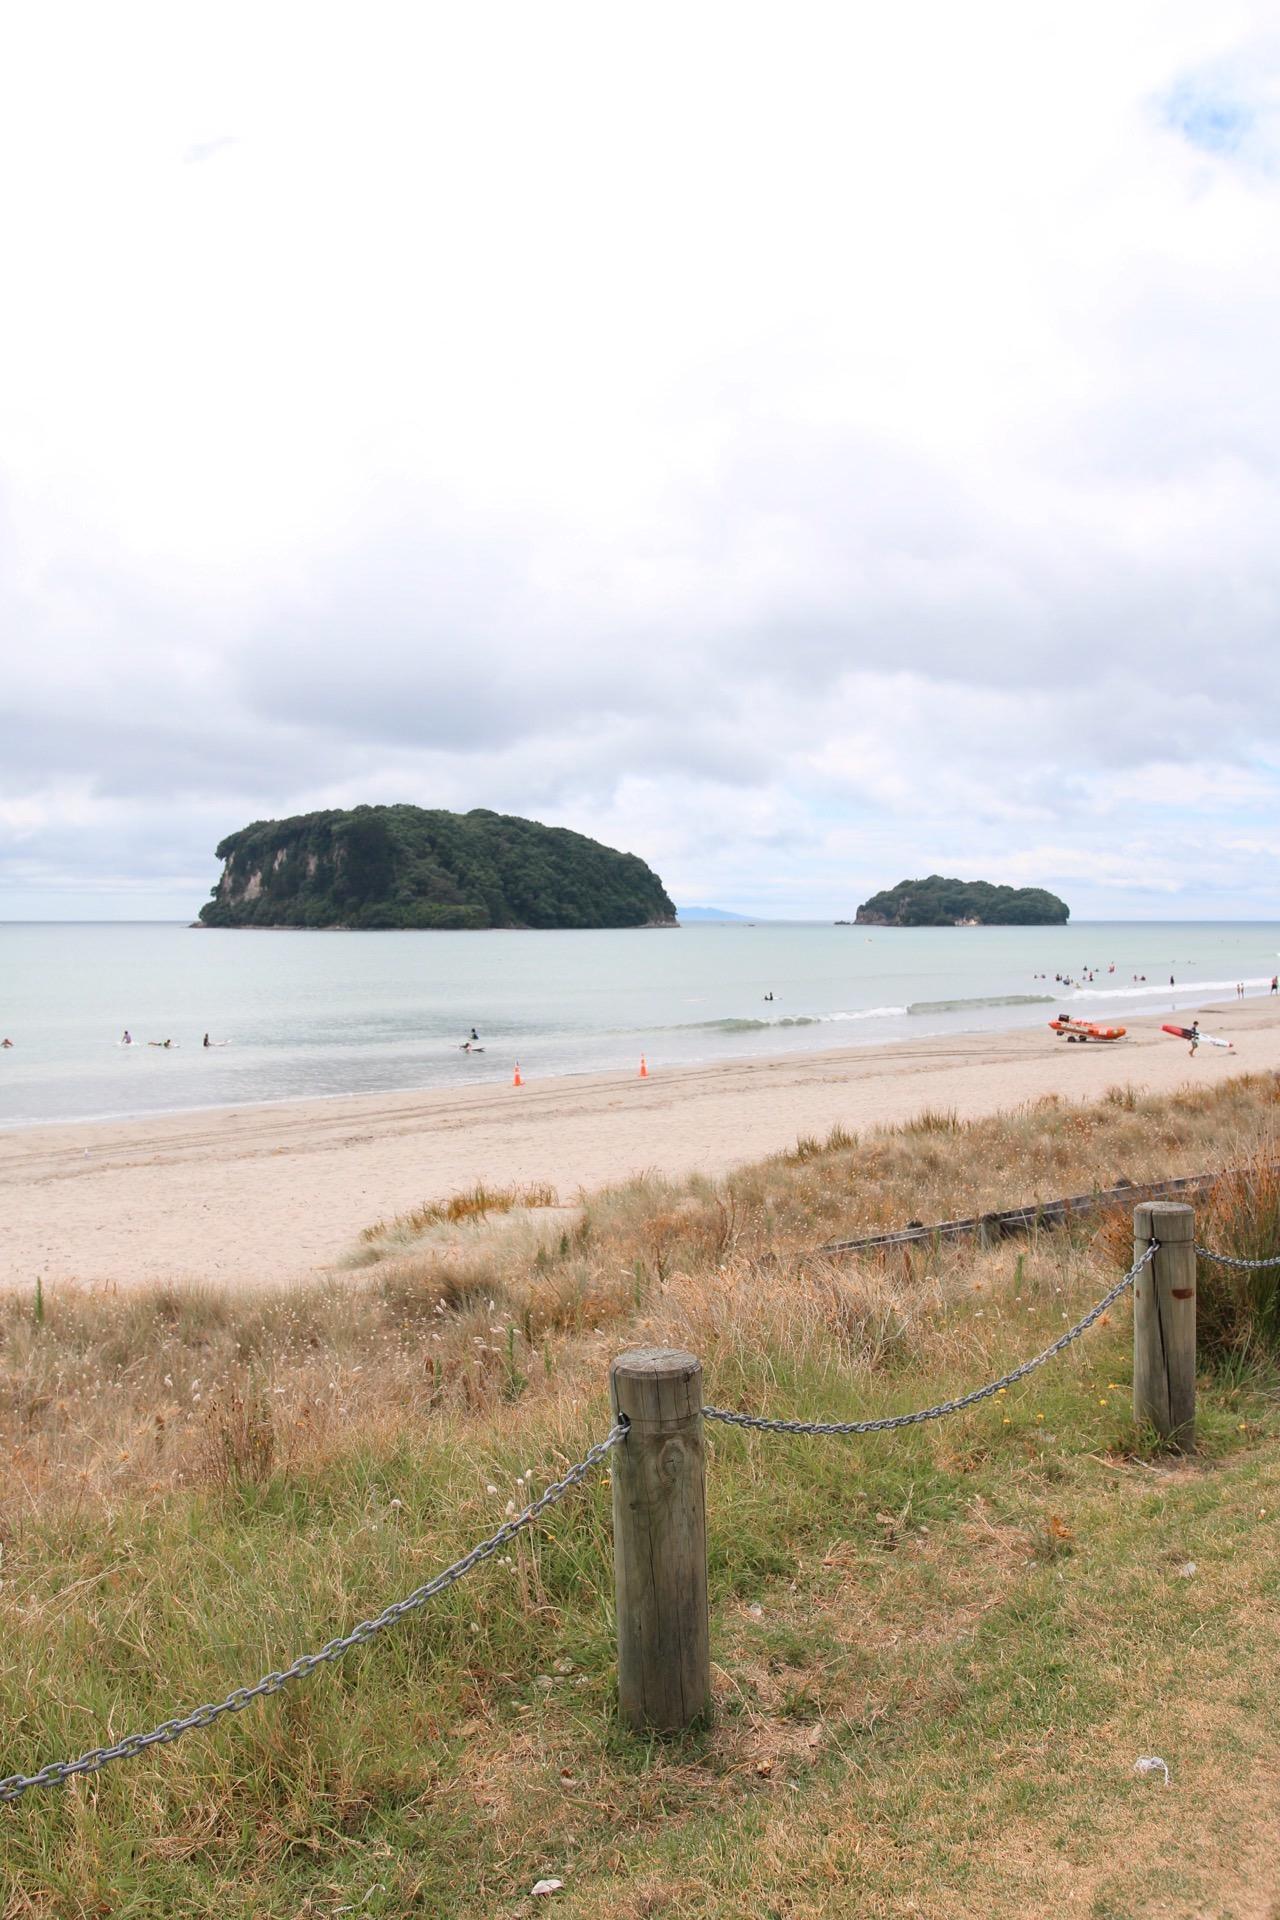 yli 40 dating Uusi-Seelanti